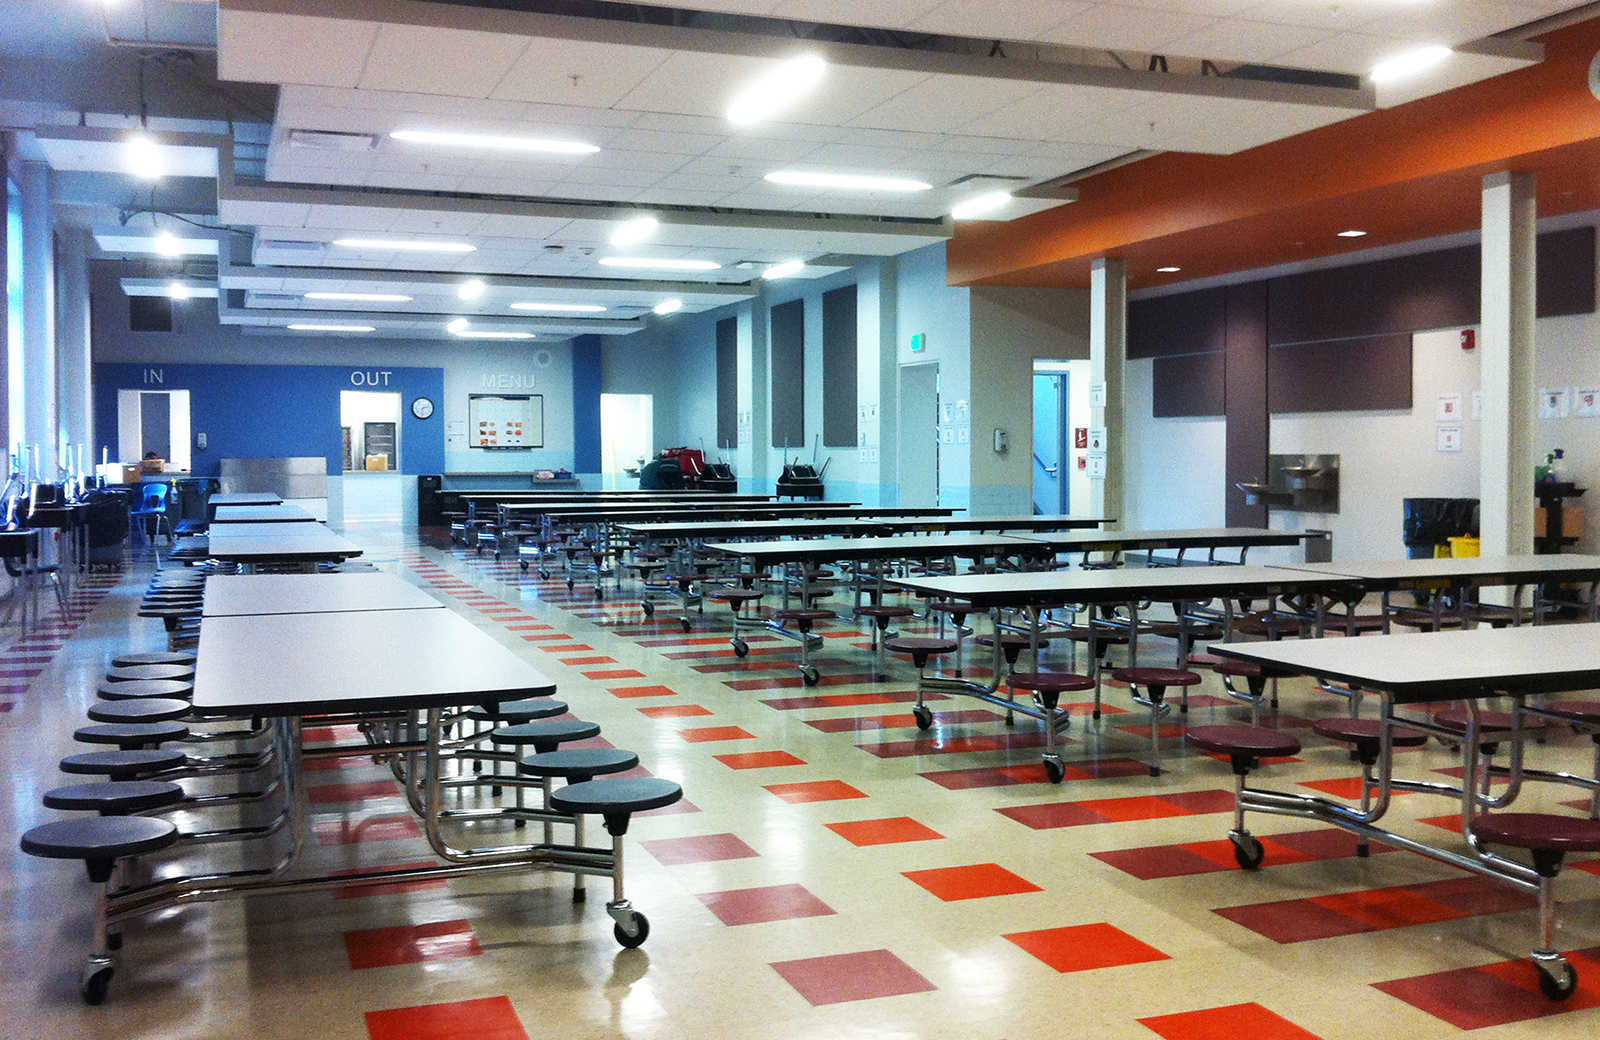 Brooke_cafeteria.jpg